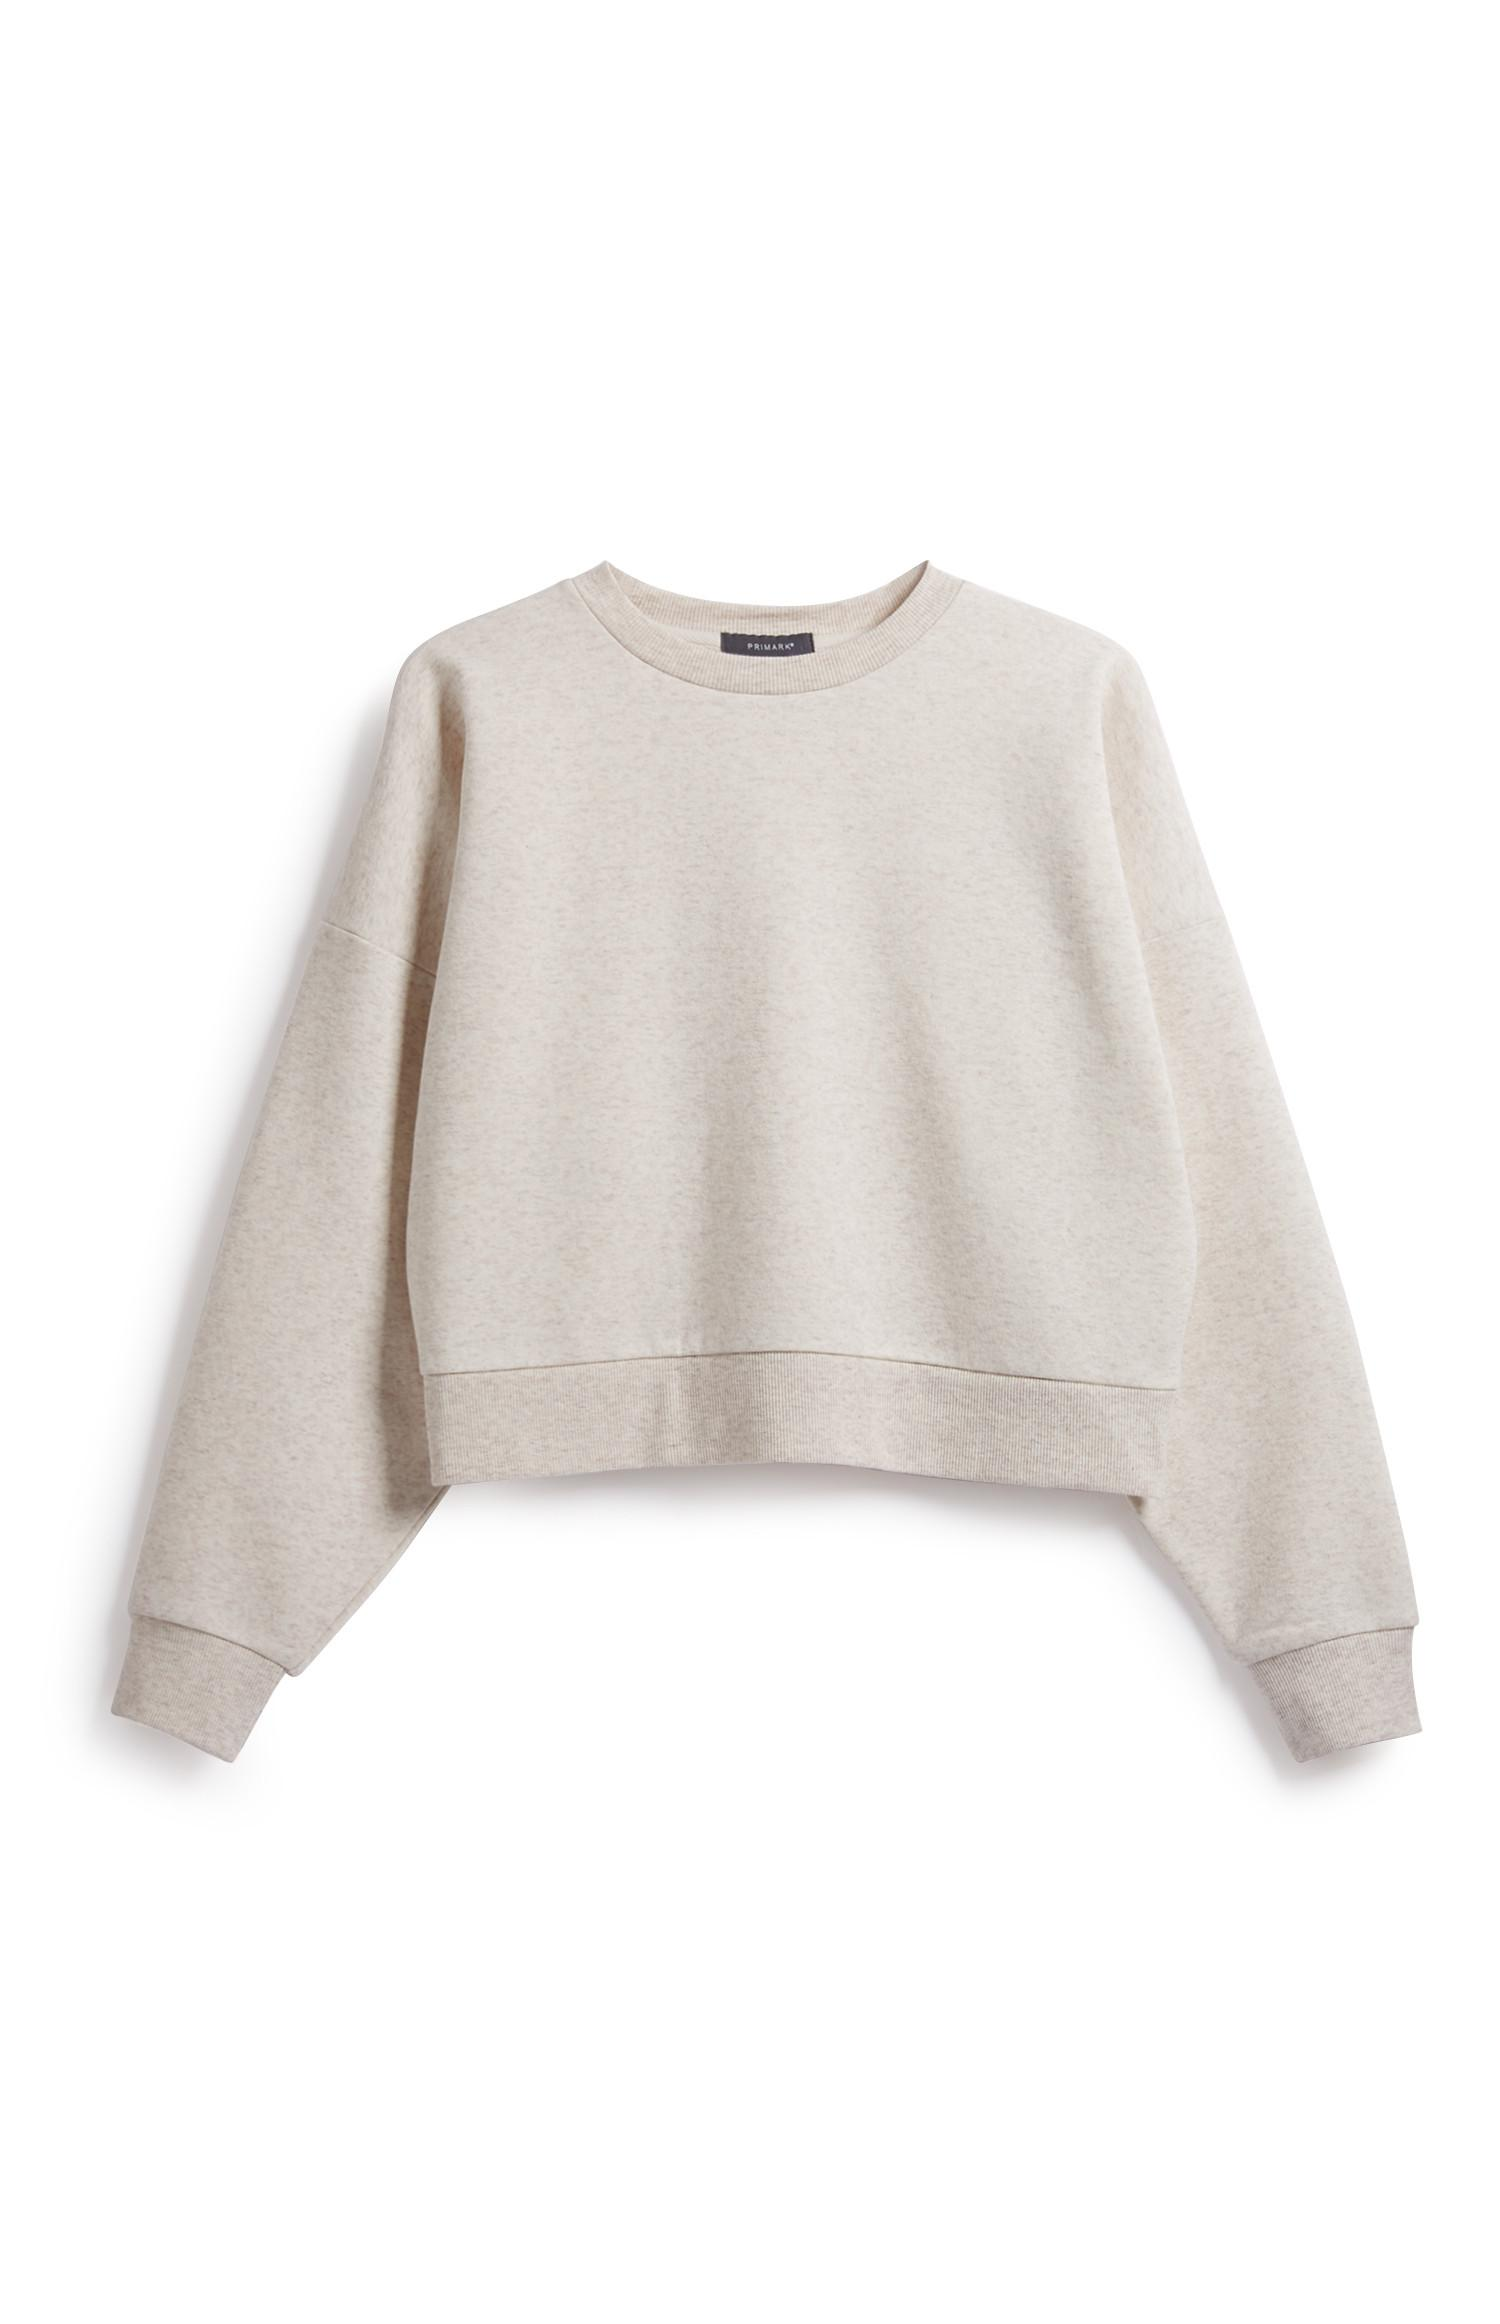 Ivory Crop Sweatshirt